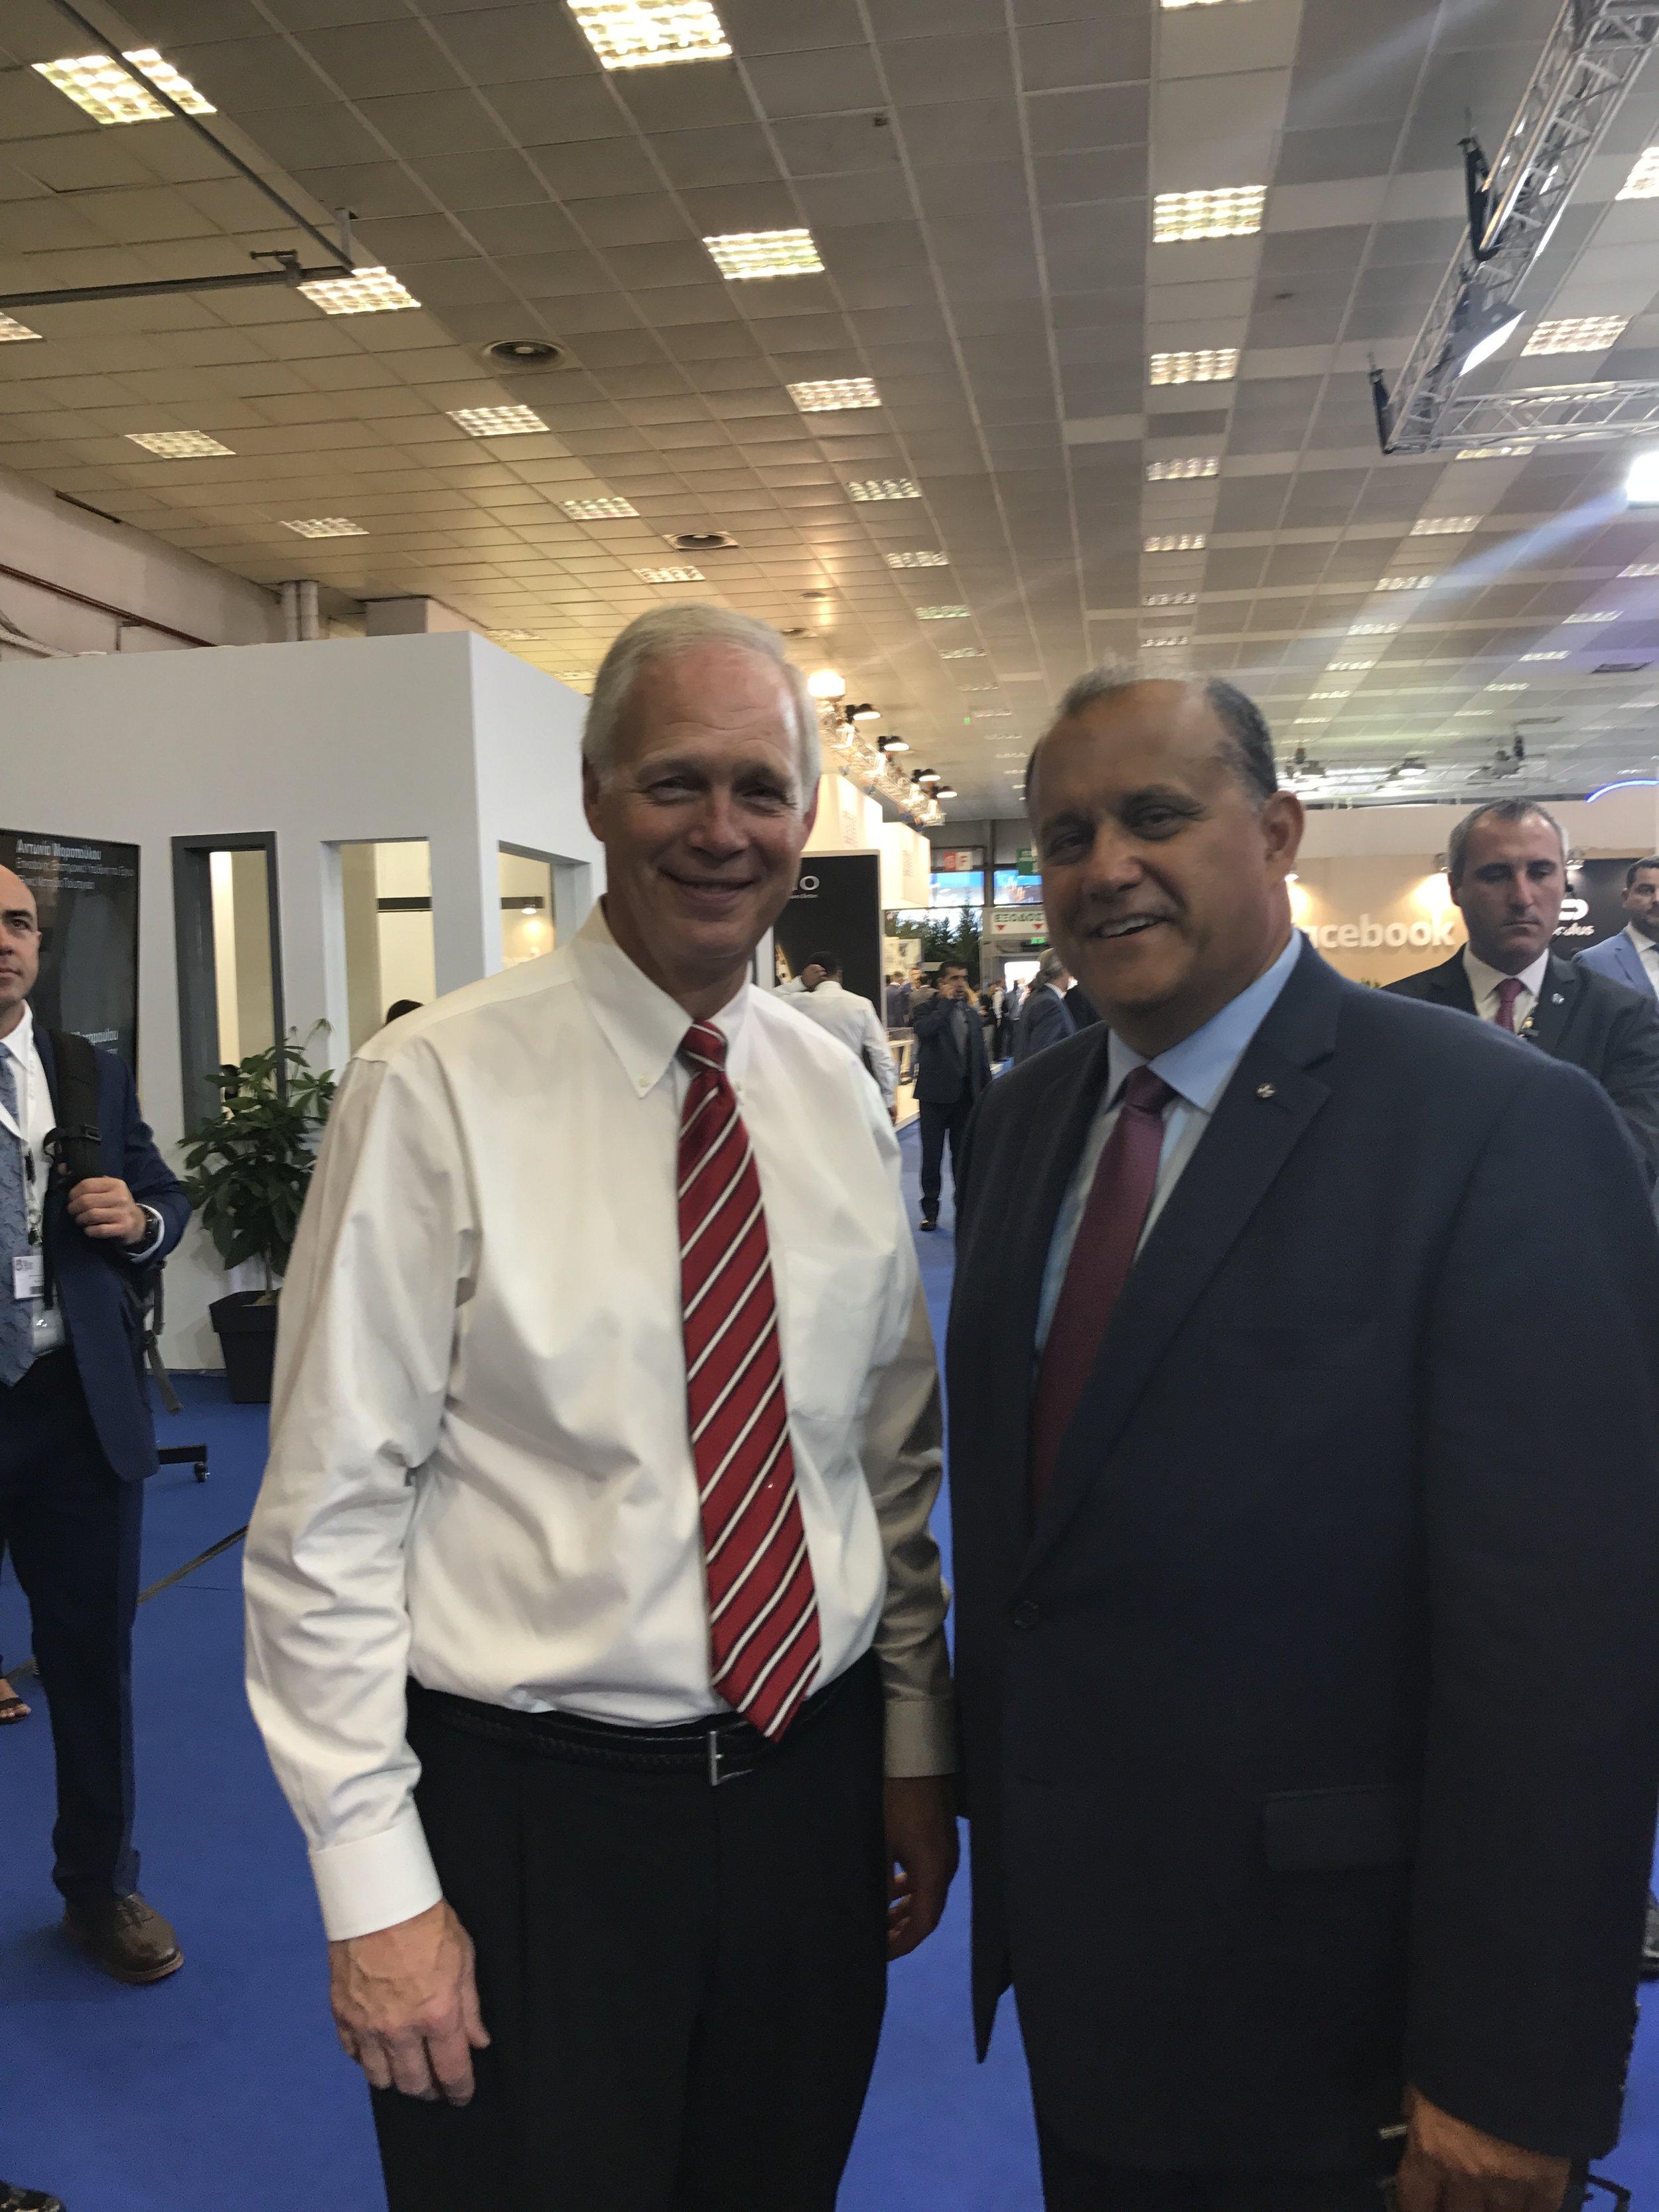 U.S. Senator Ron Johnson (R-WI) and Nick Larigakis.